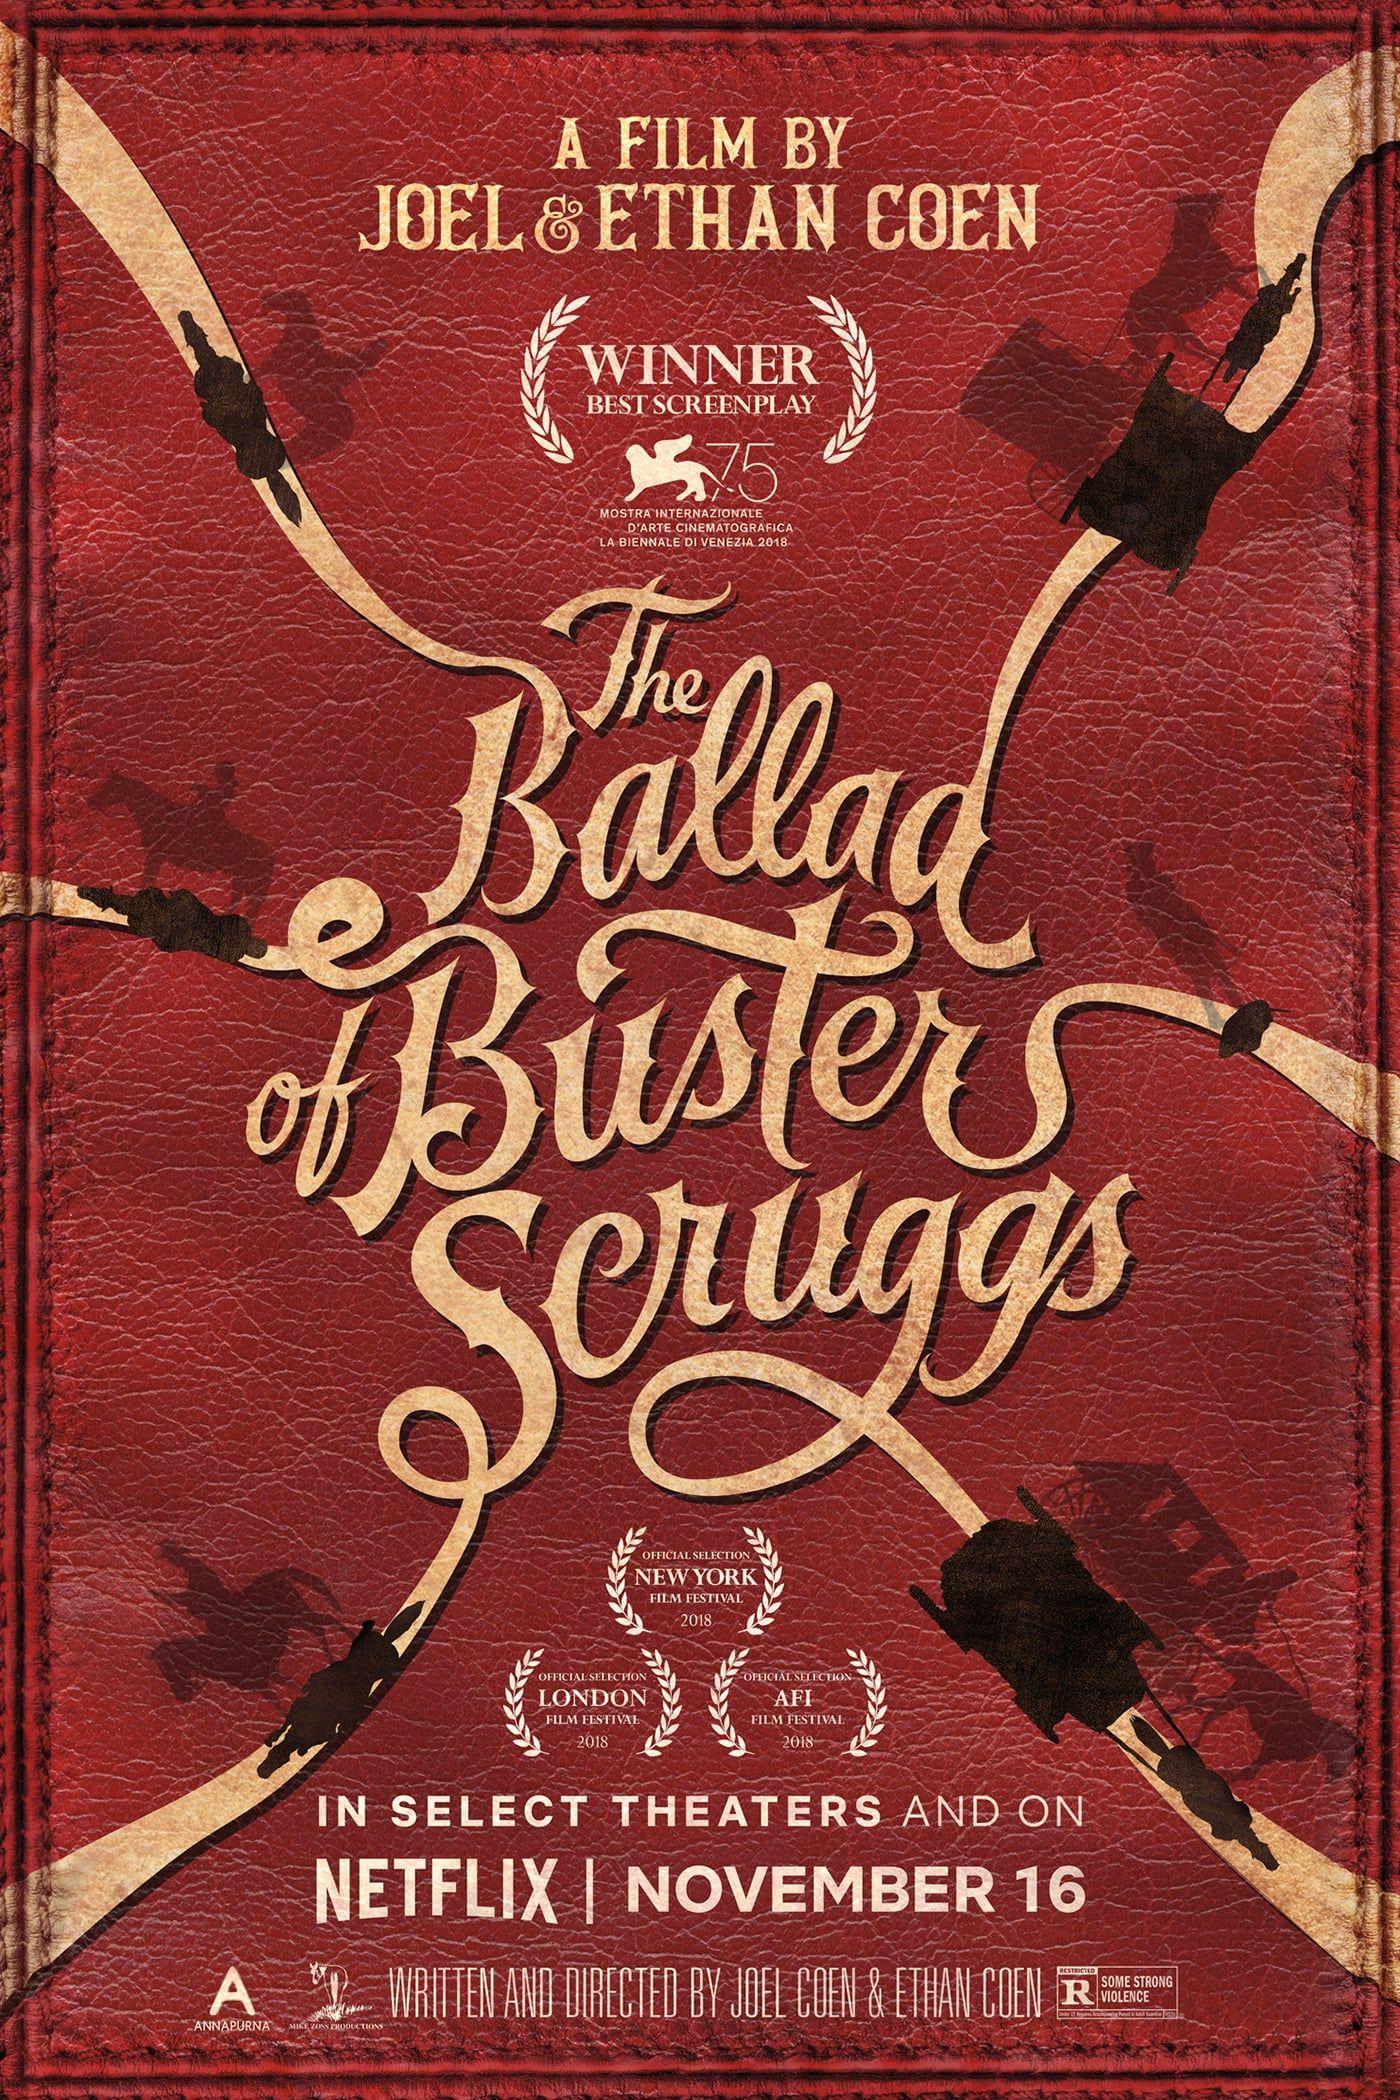 Assistir The Ballad Of Buster Scruggs Dublado Online Hd Os